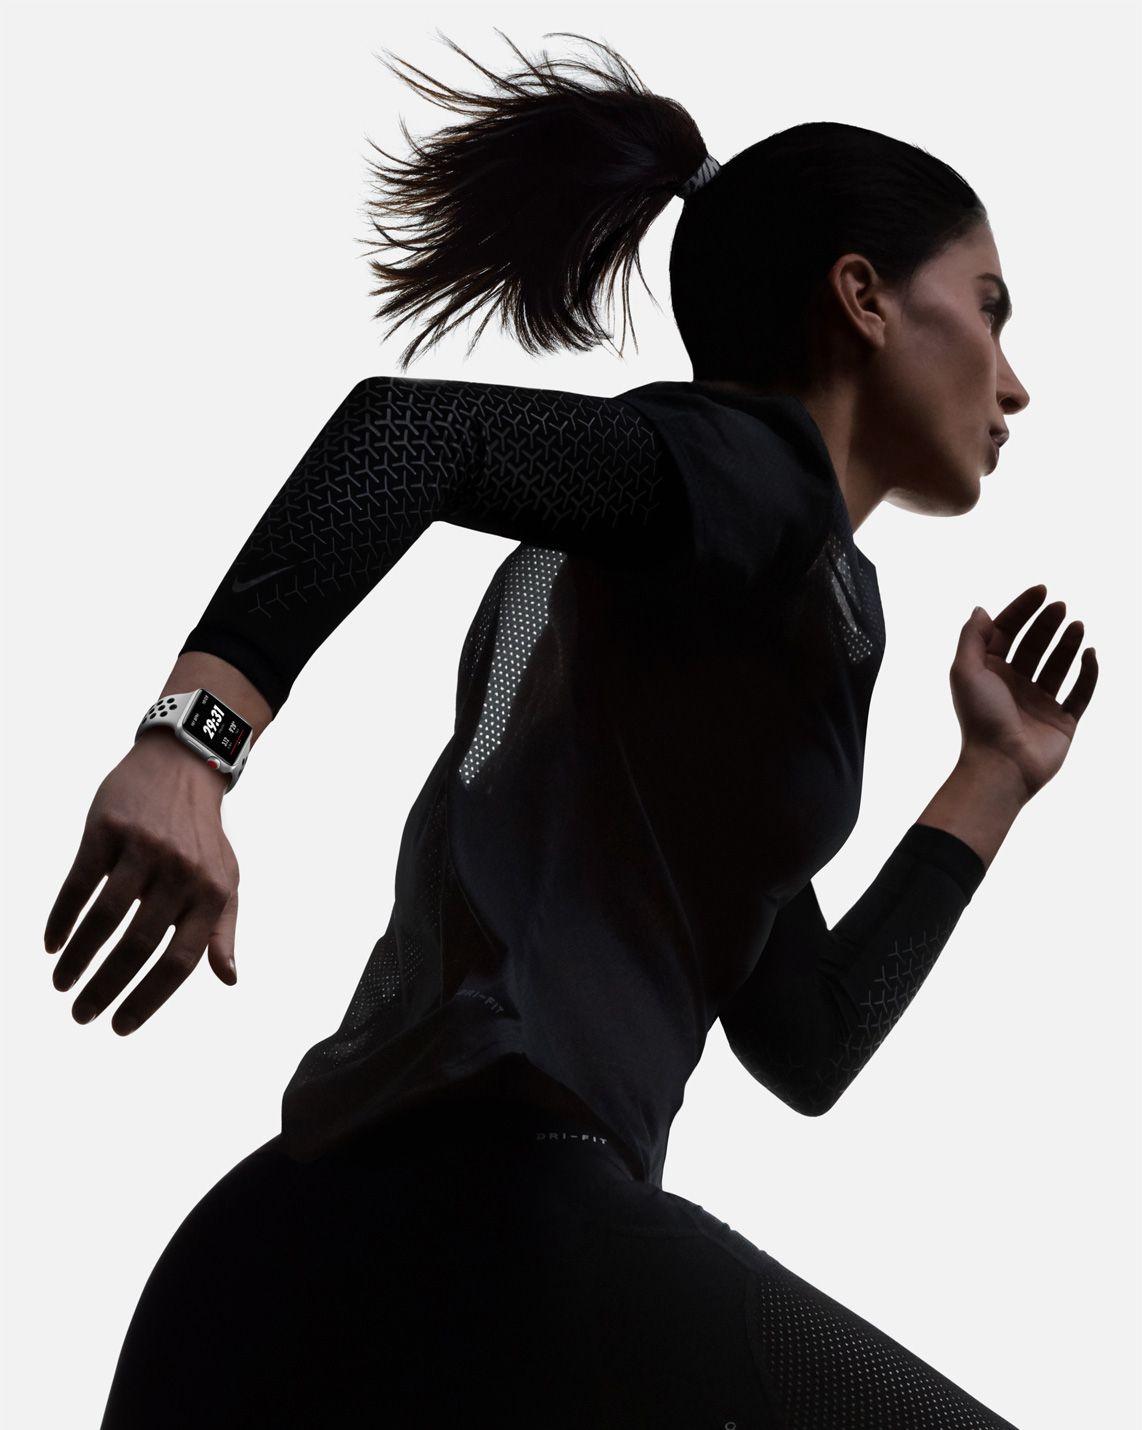 watch_series_3_running_nike